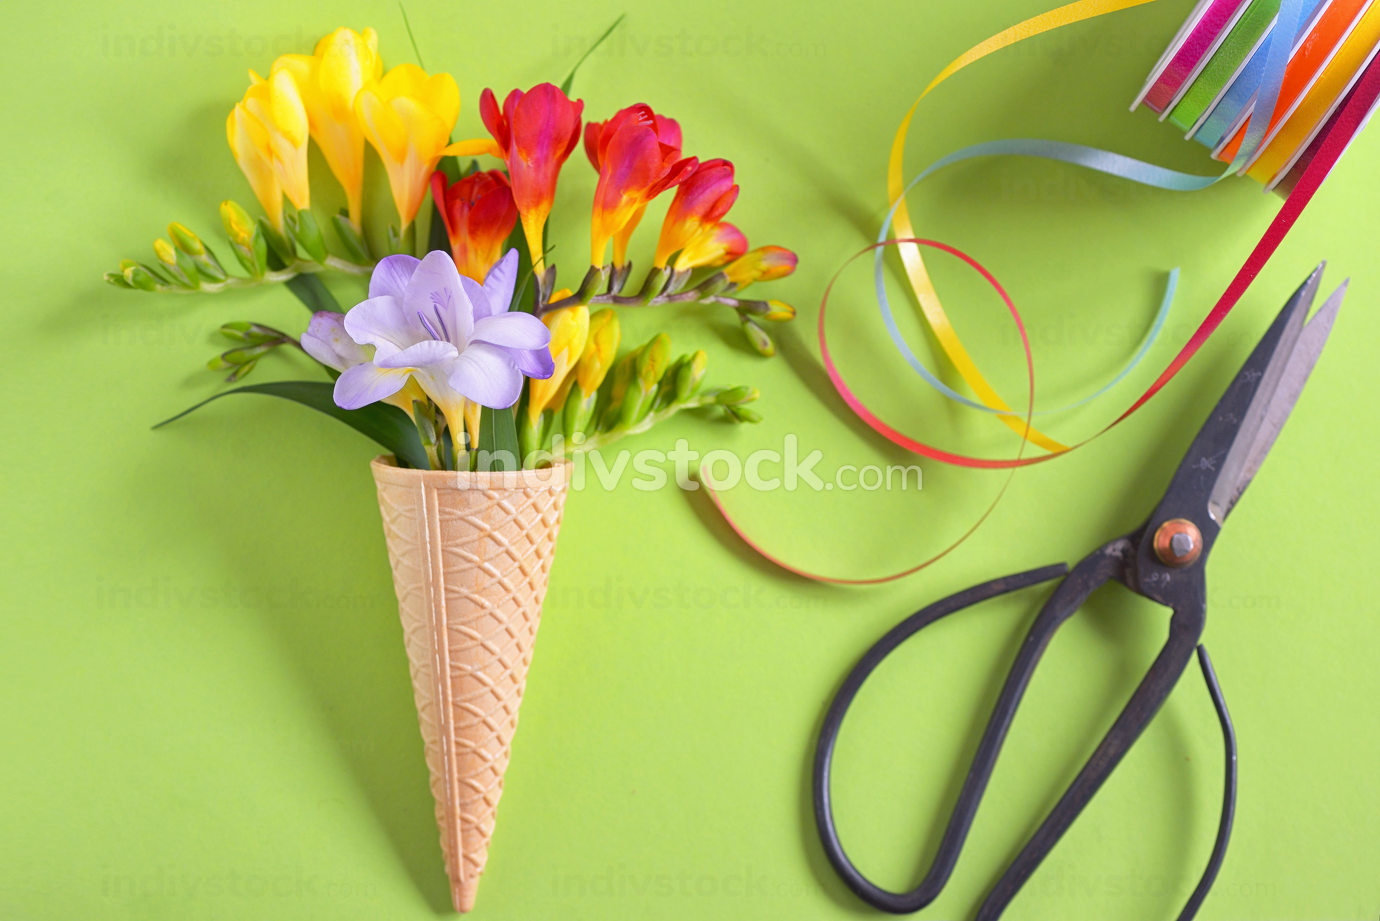 Freesias flowers in ice cream waffles and scissors